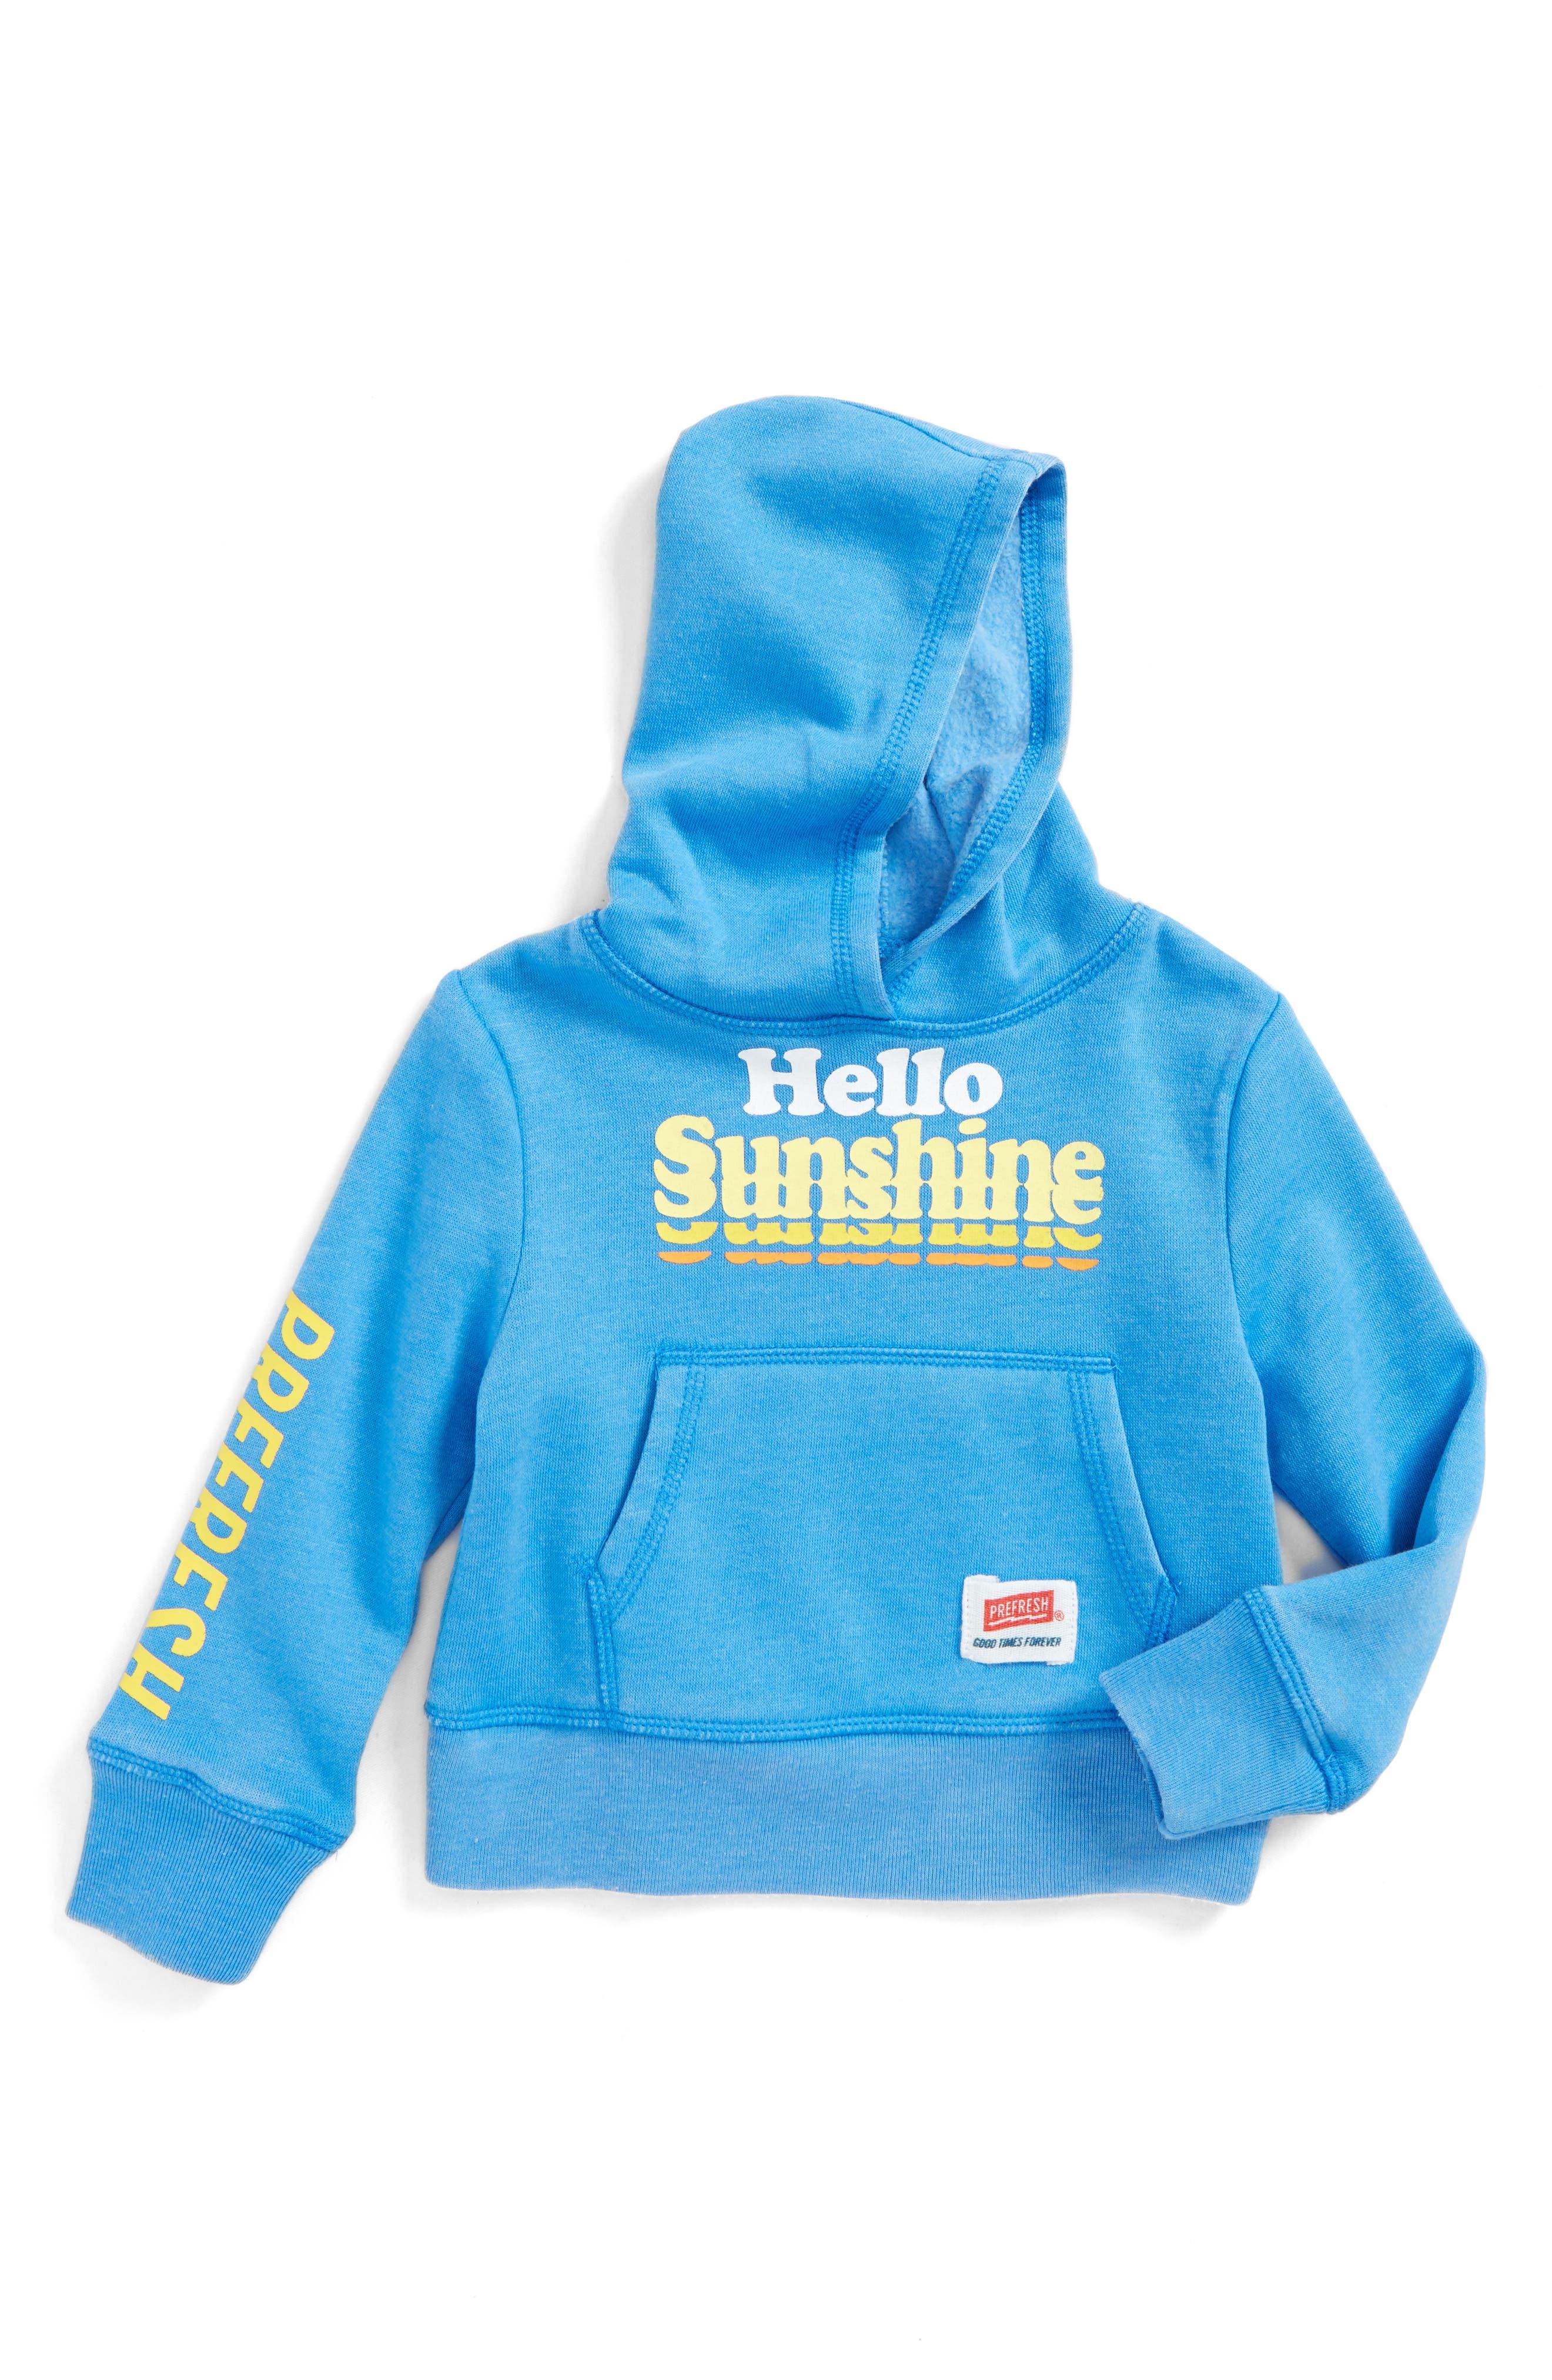 Main Image - Prefresh Hello Sunshine Hoodie (Baby Boys)